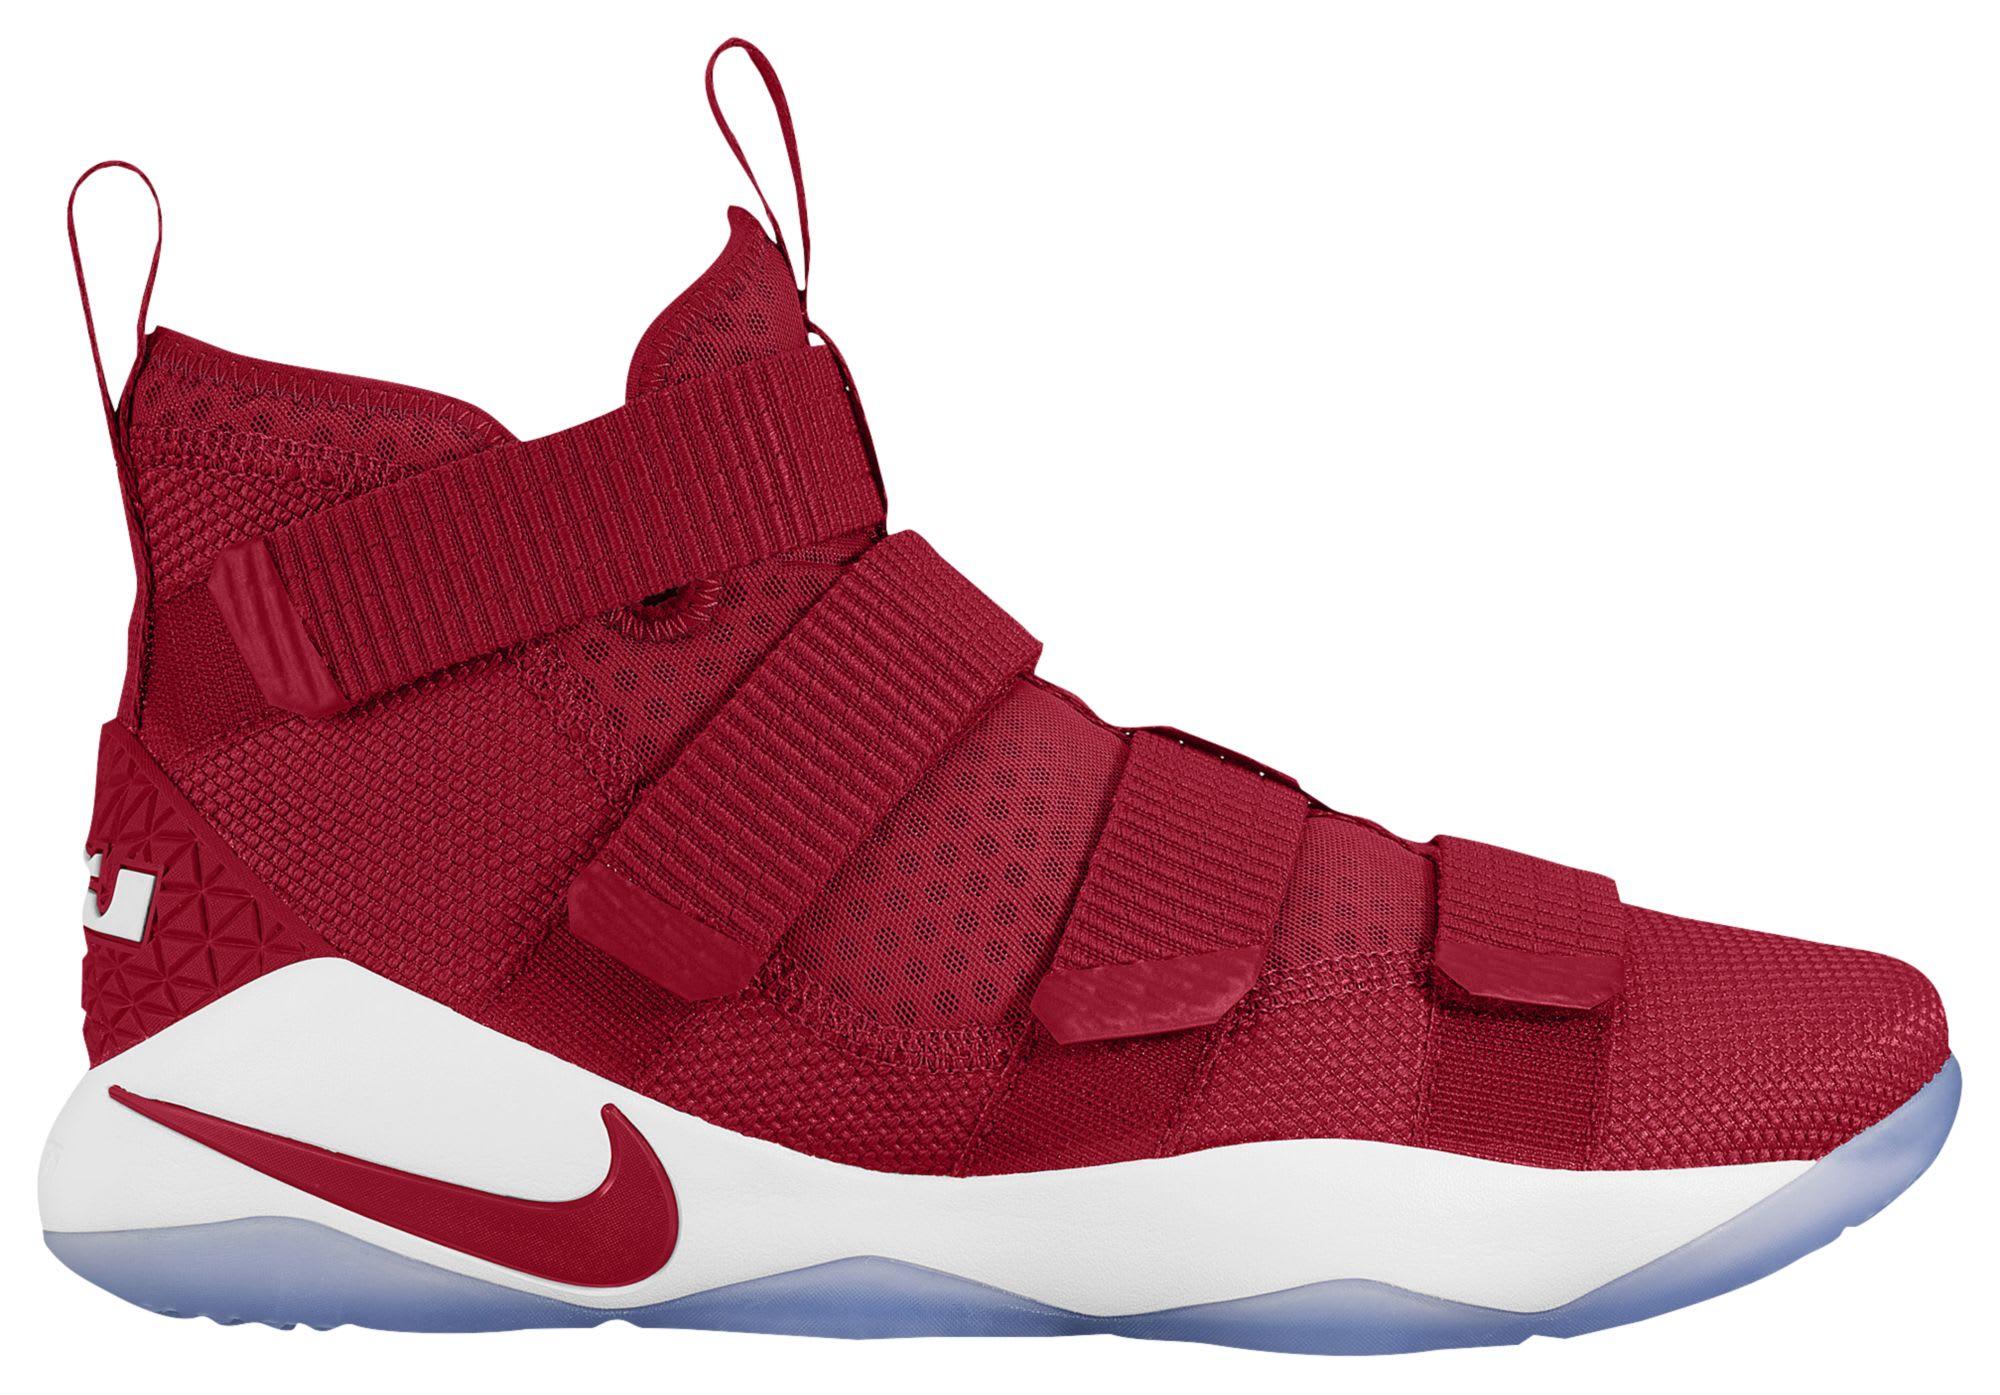 49bc0af7b13e ... Nike LeBron Soldier 11 TB Gym Red ...